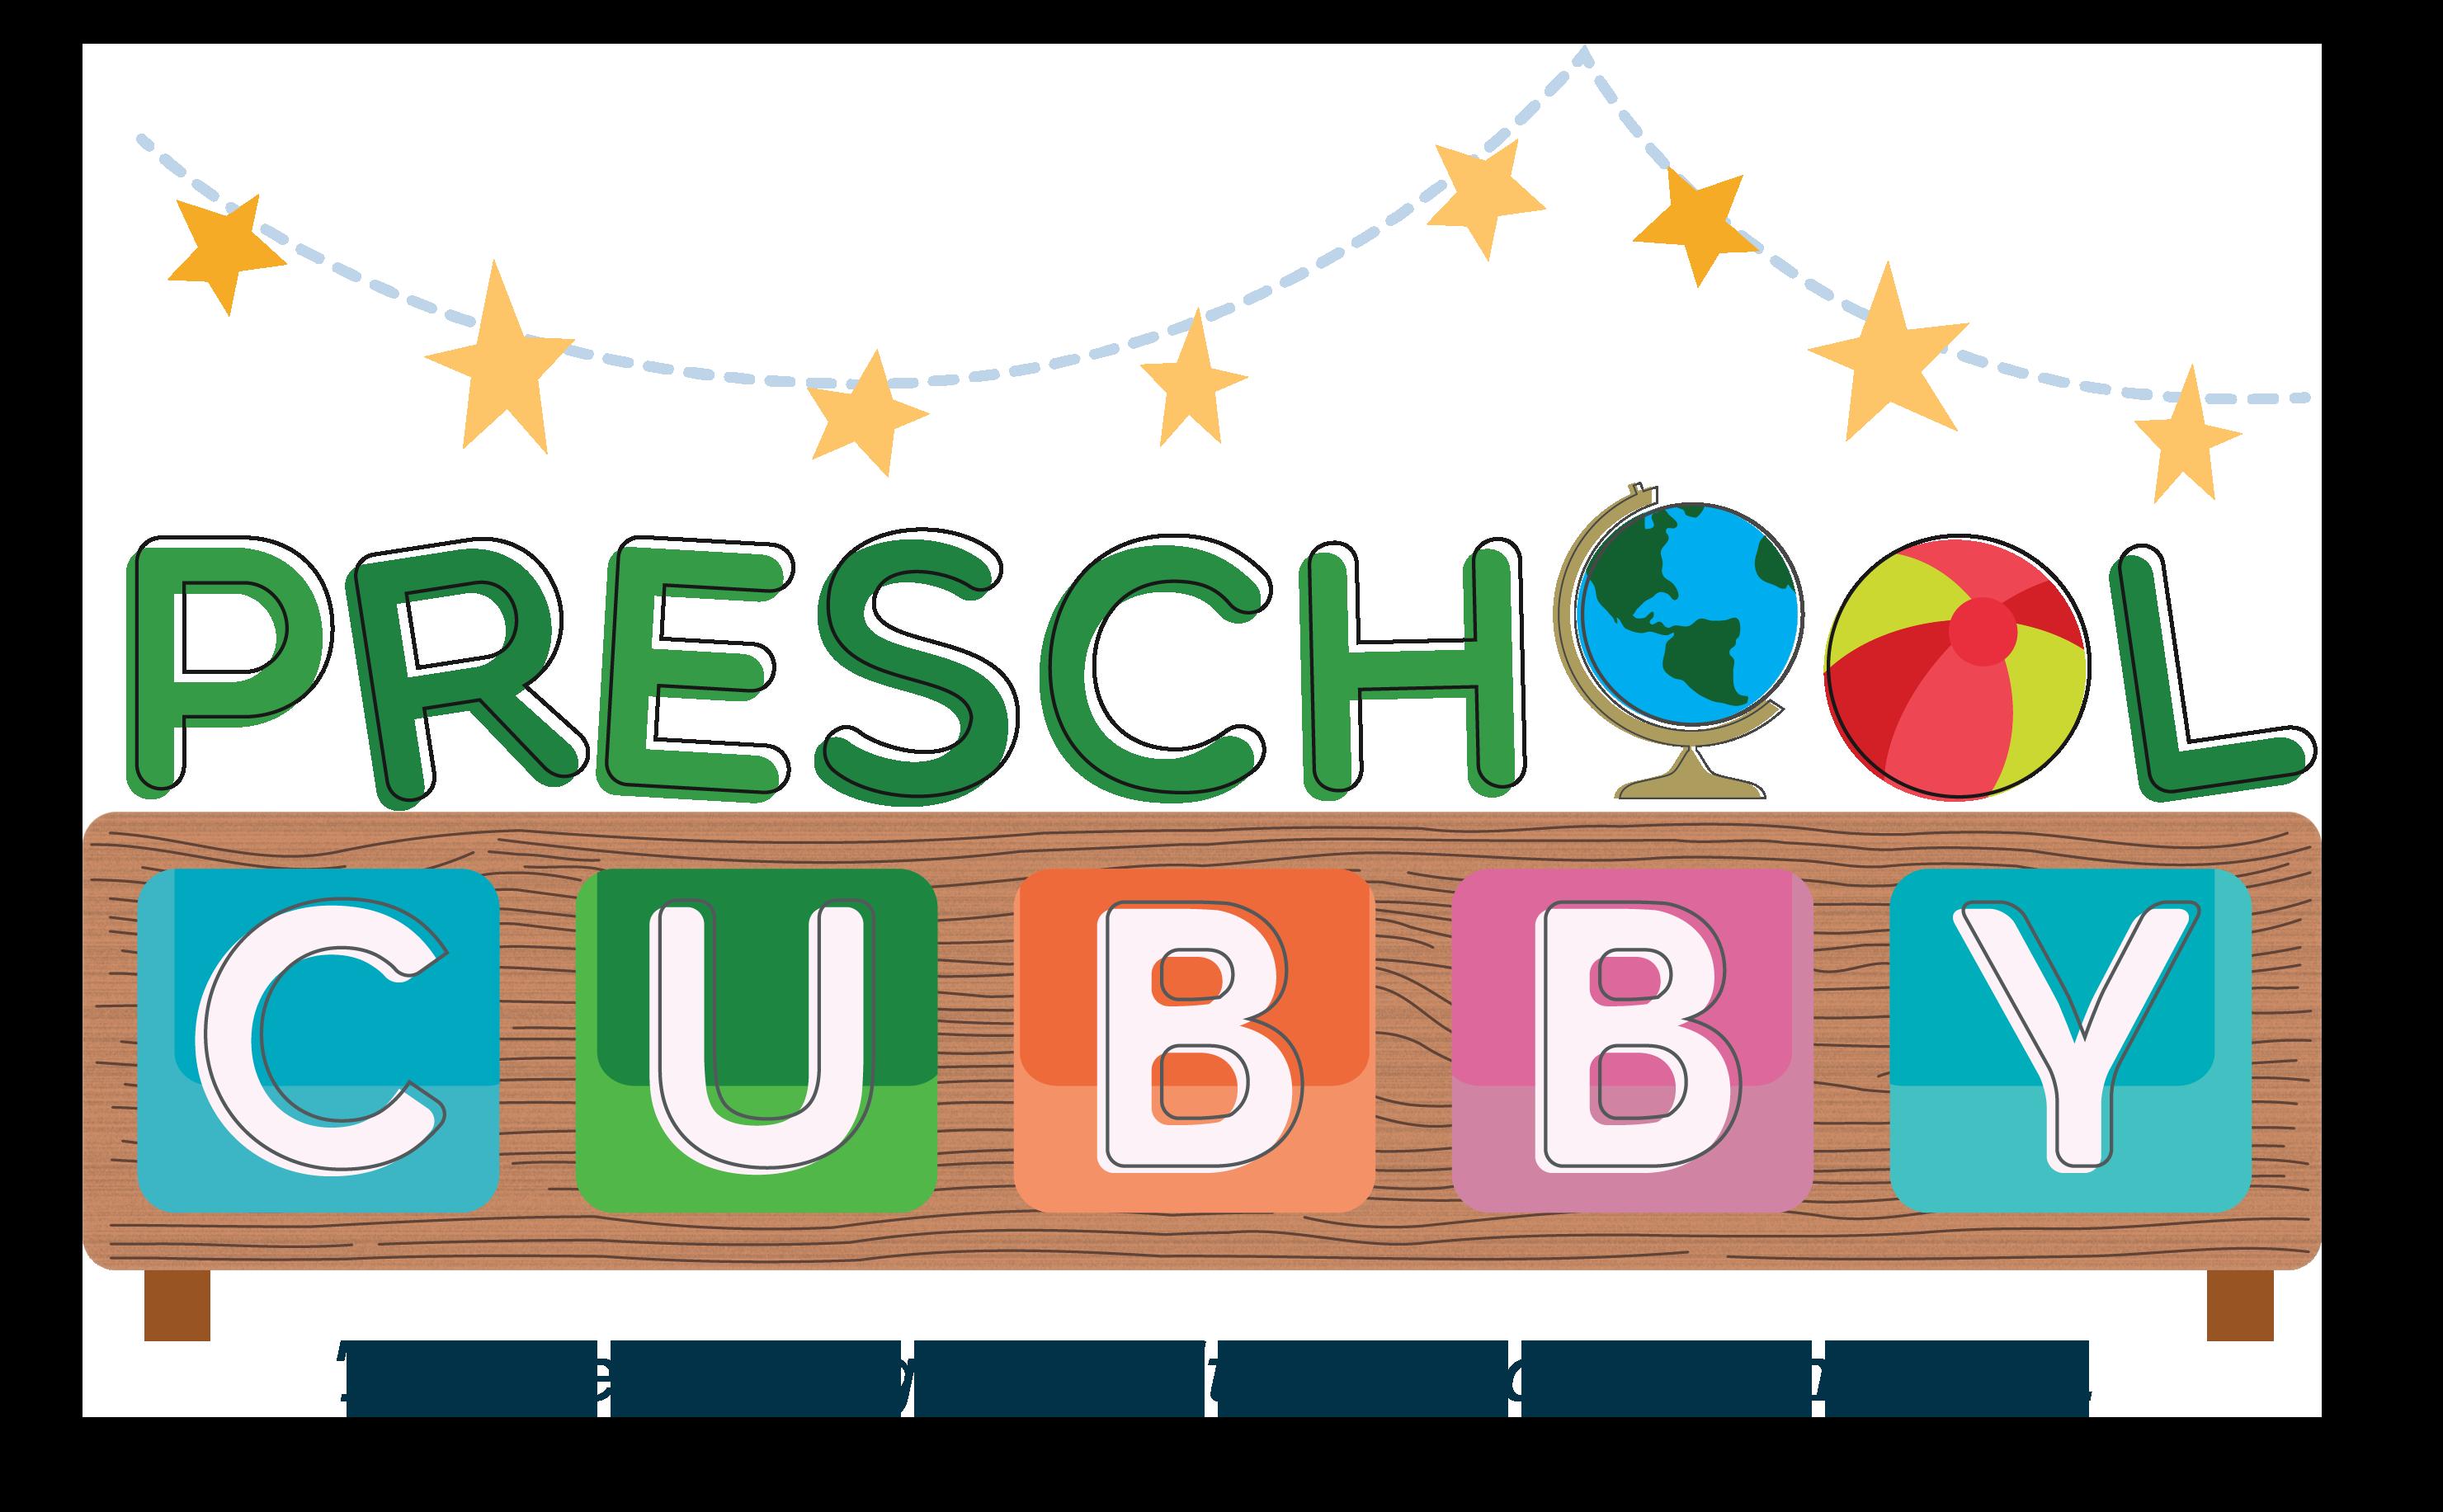 preschool cubby logo